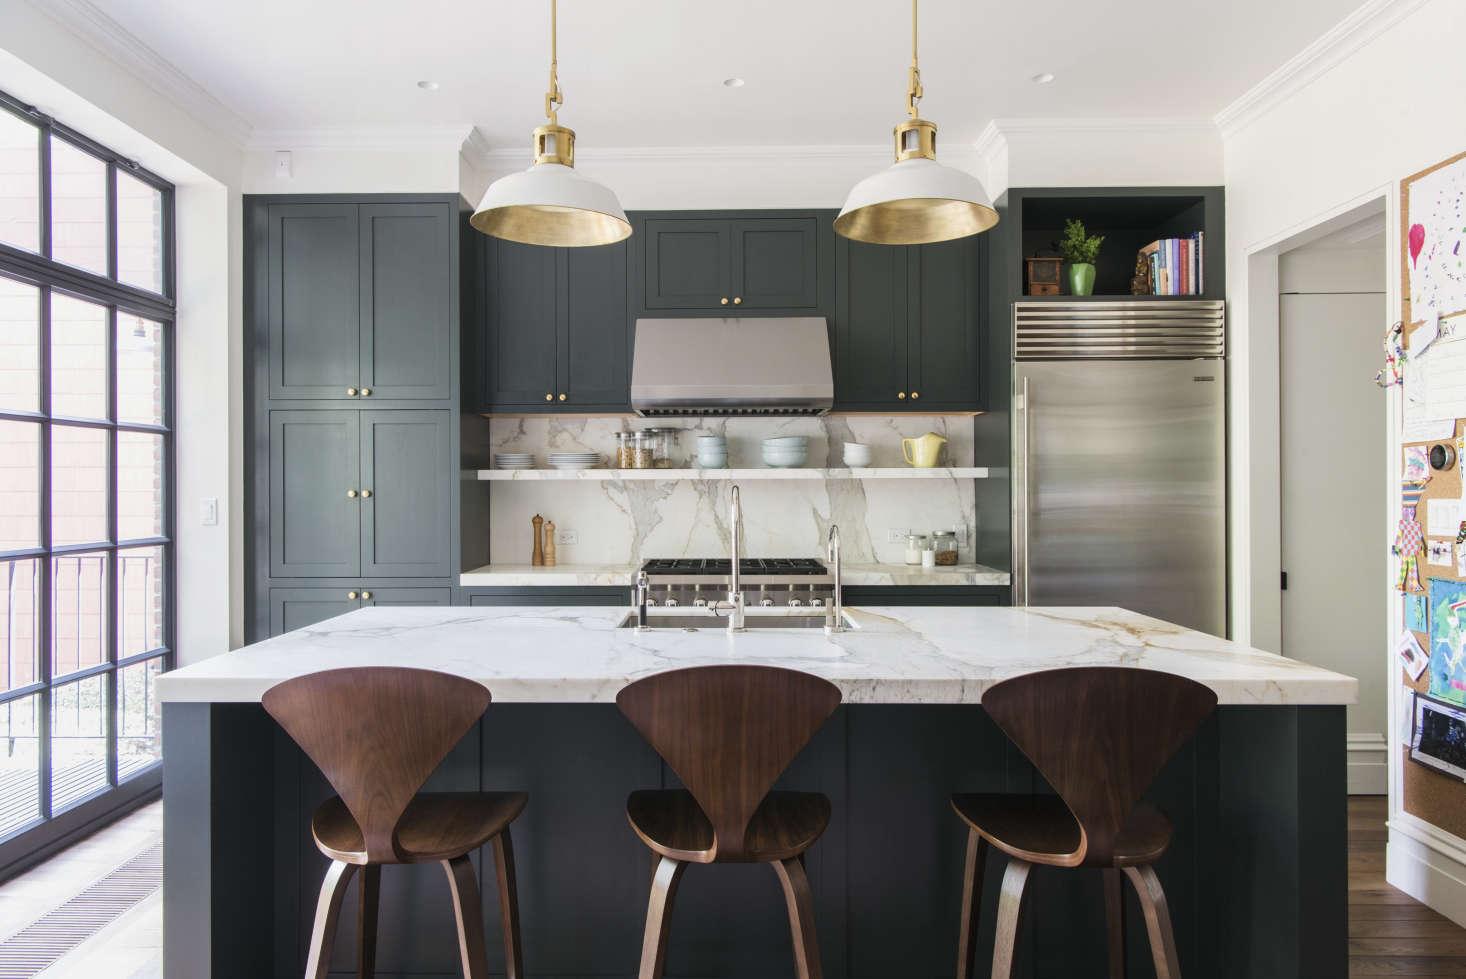 Fullsize Of Green Kitchen Cabinets